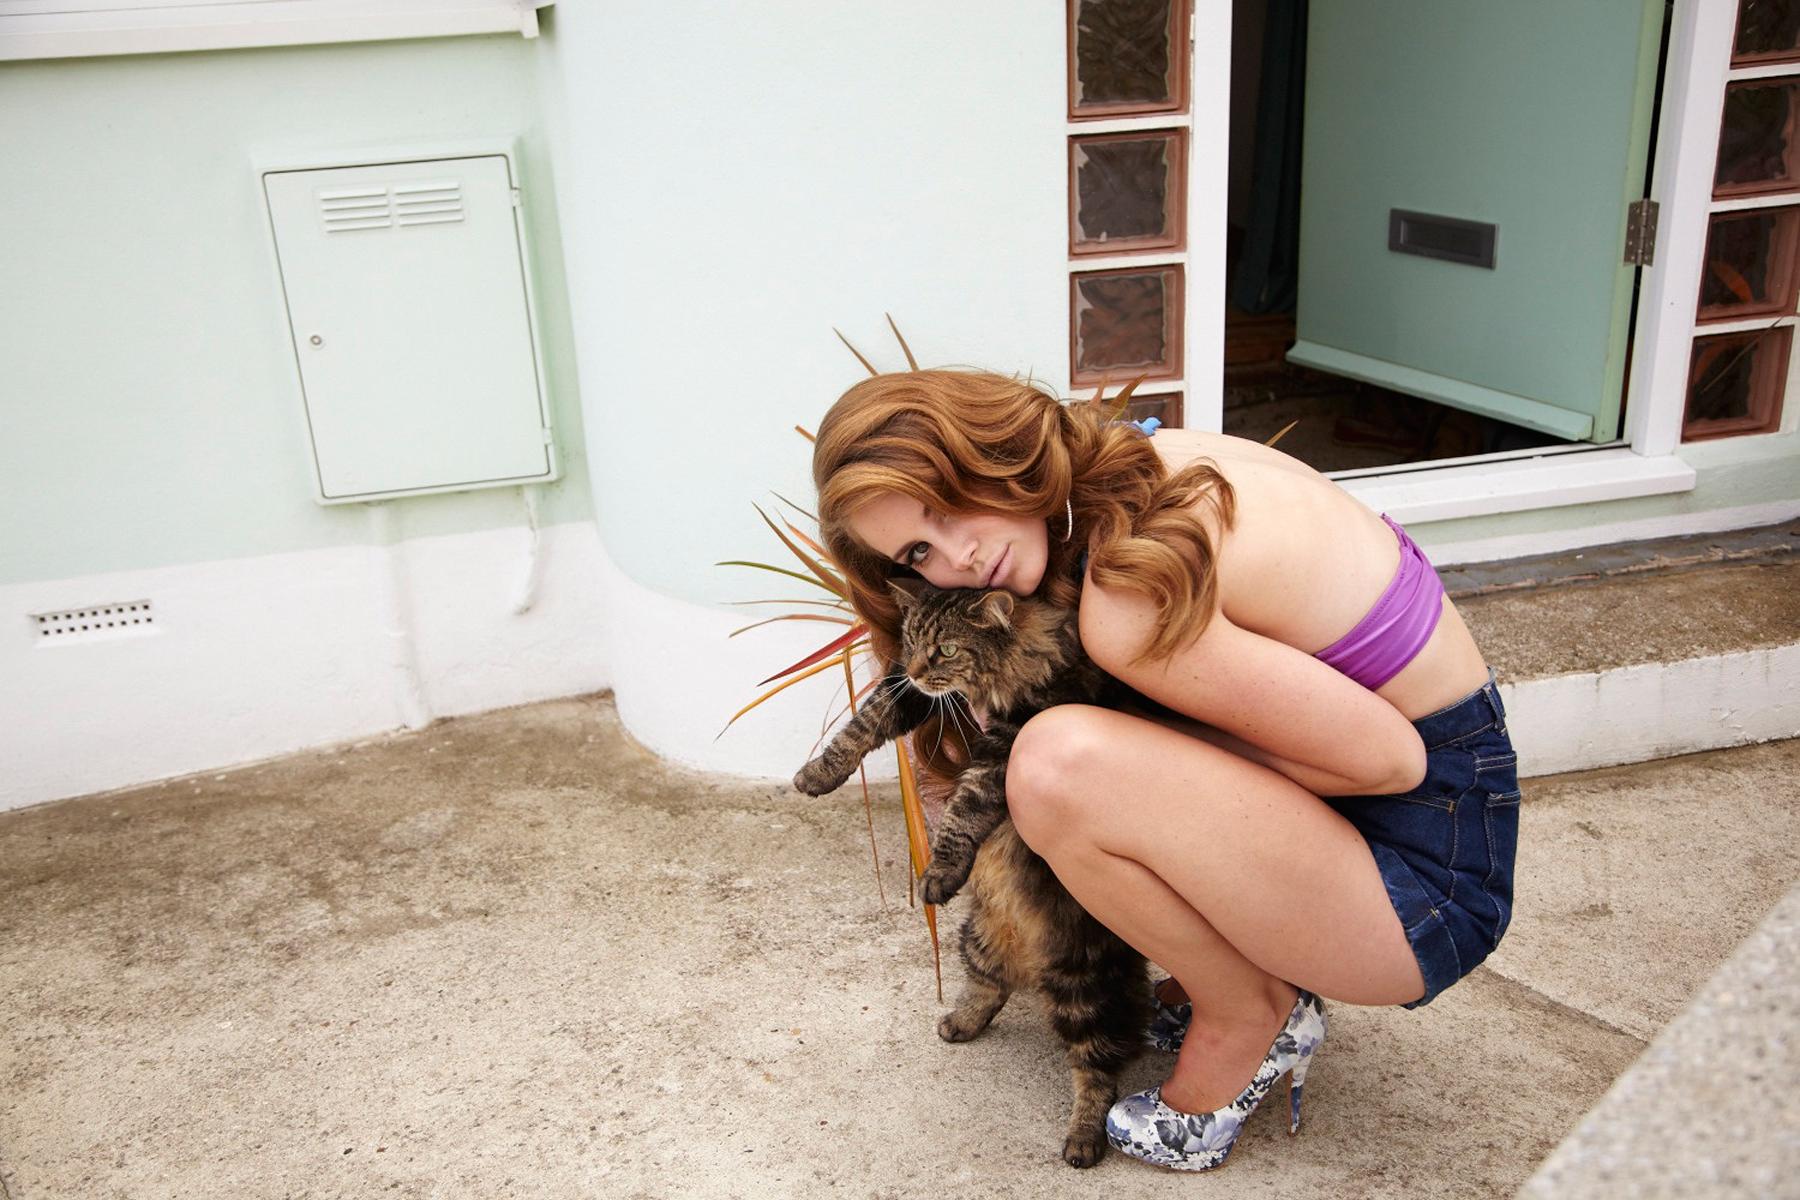 Lana Del Rey Working with Dan Auerbach on New Album